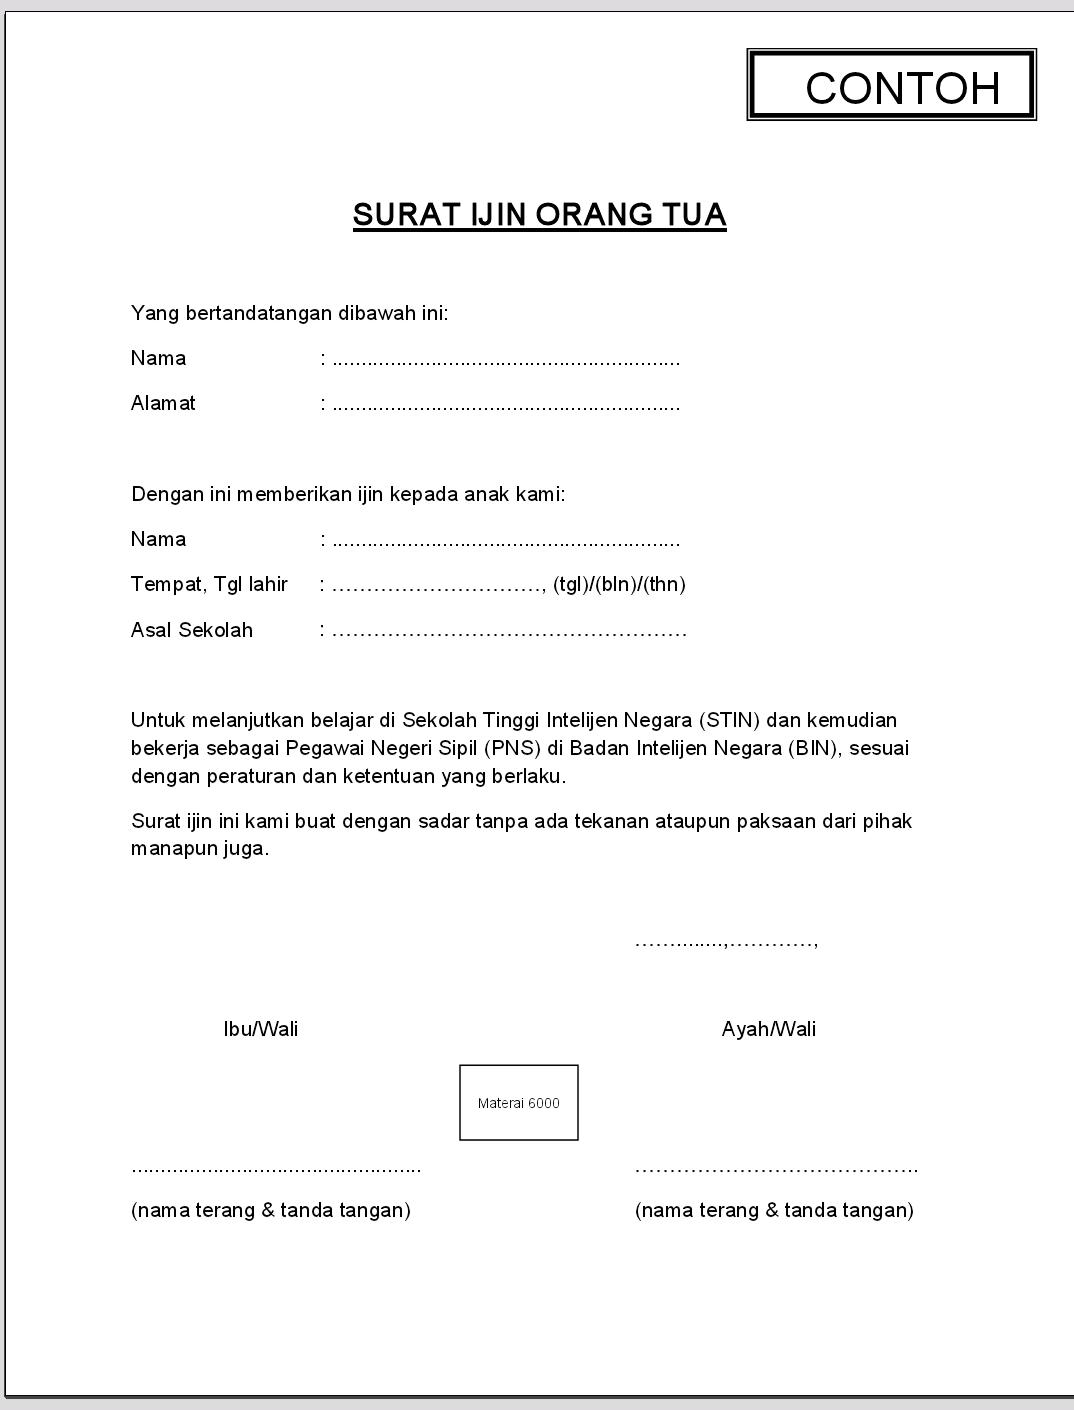 Contoh Surat Izin Orang Tua Informasi Vivo V7